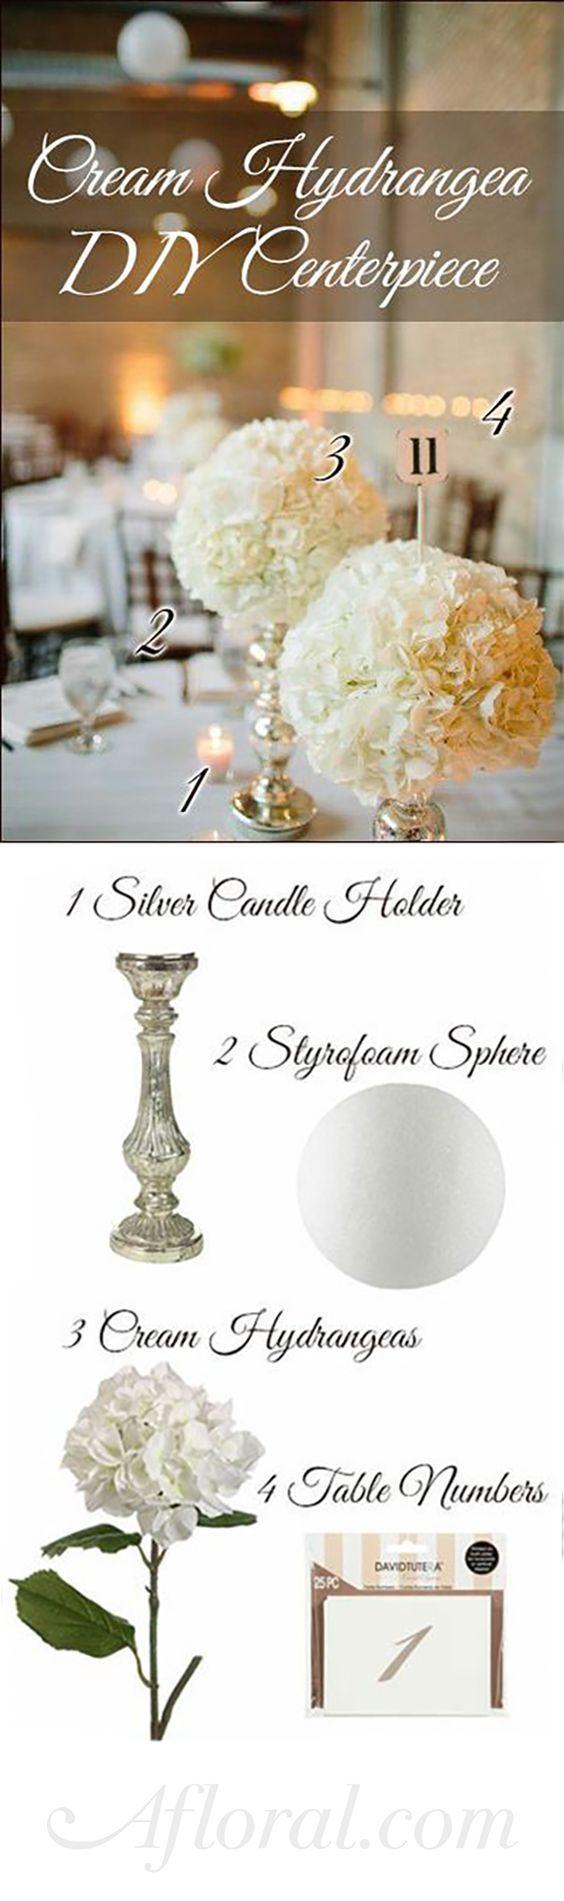 DIY hydrangea centerpiece ideas for your wedding reception.